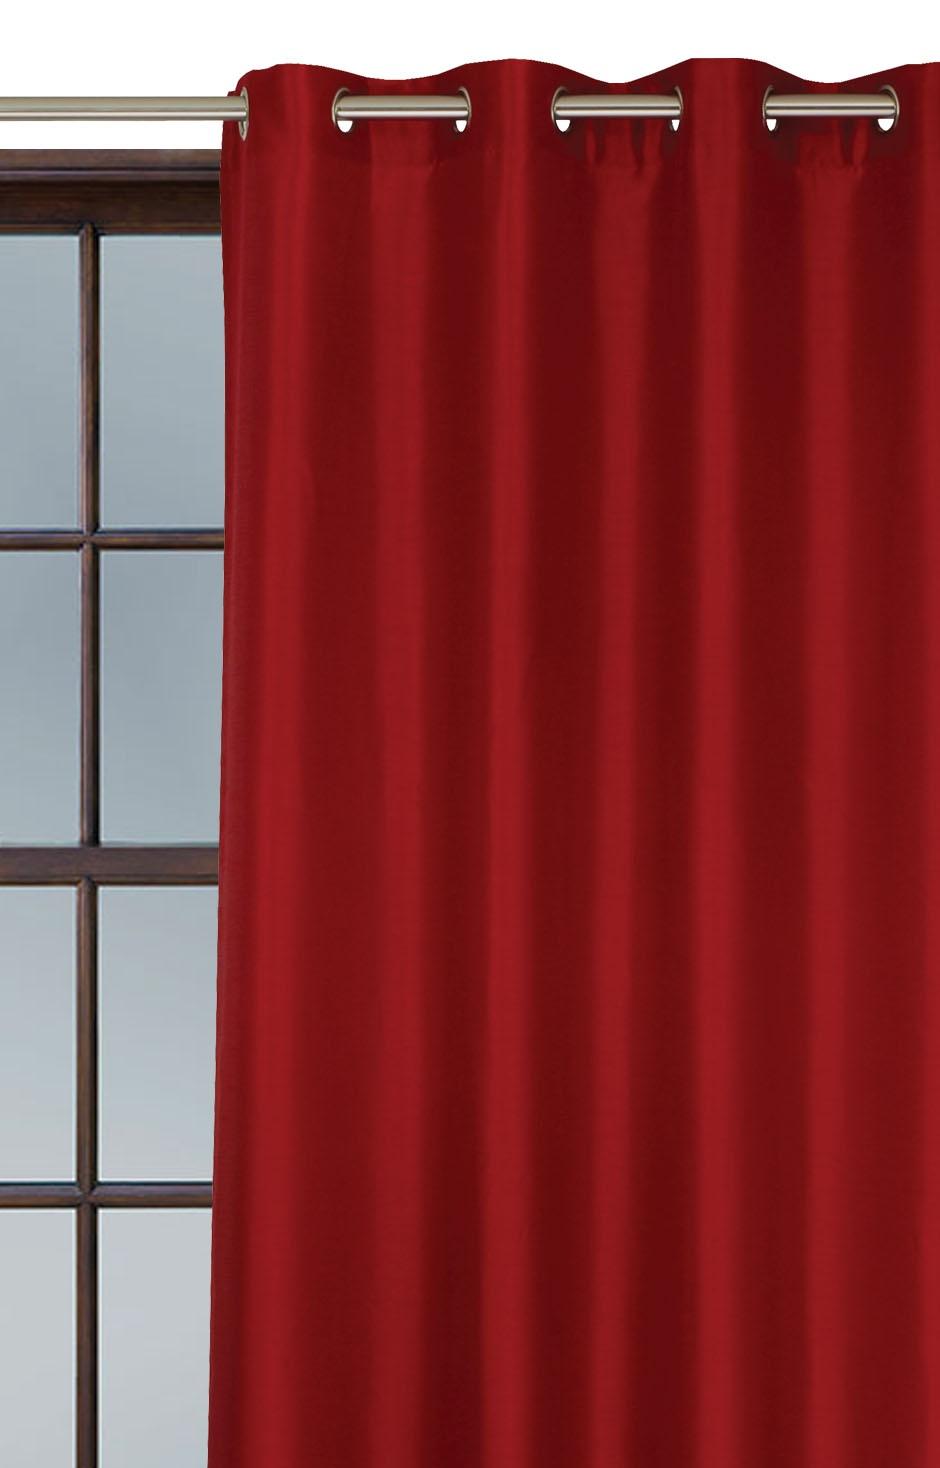 BALLERINA Rouge / Red